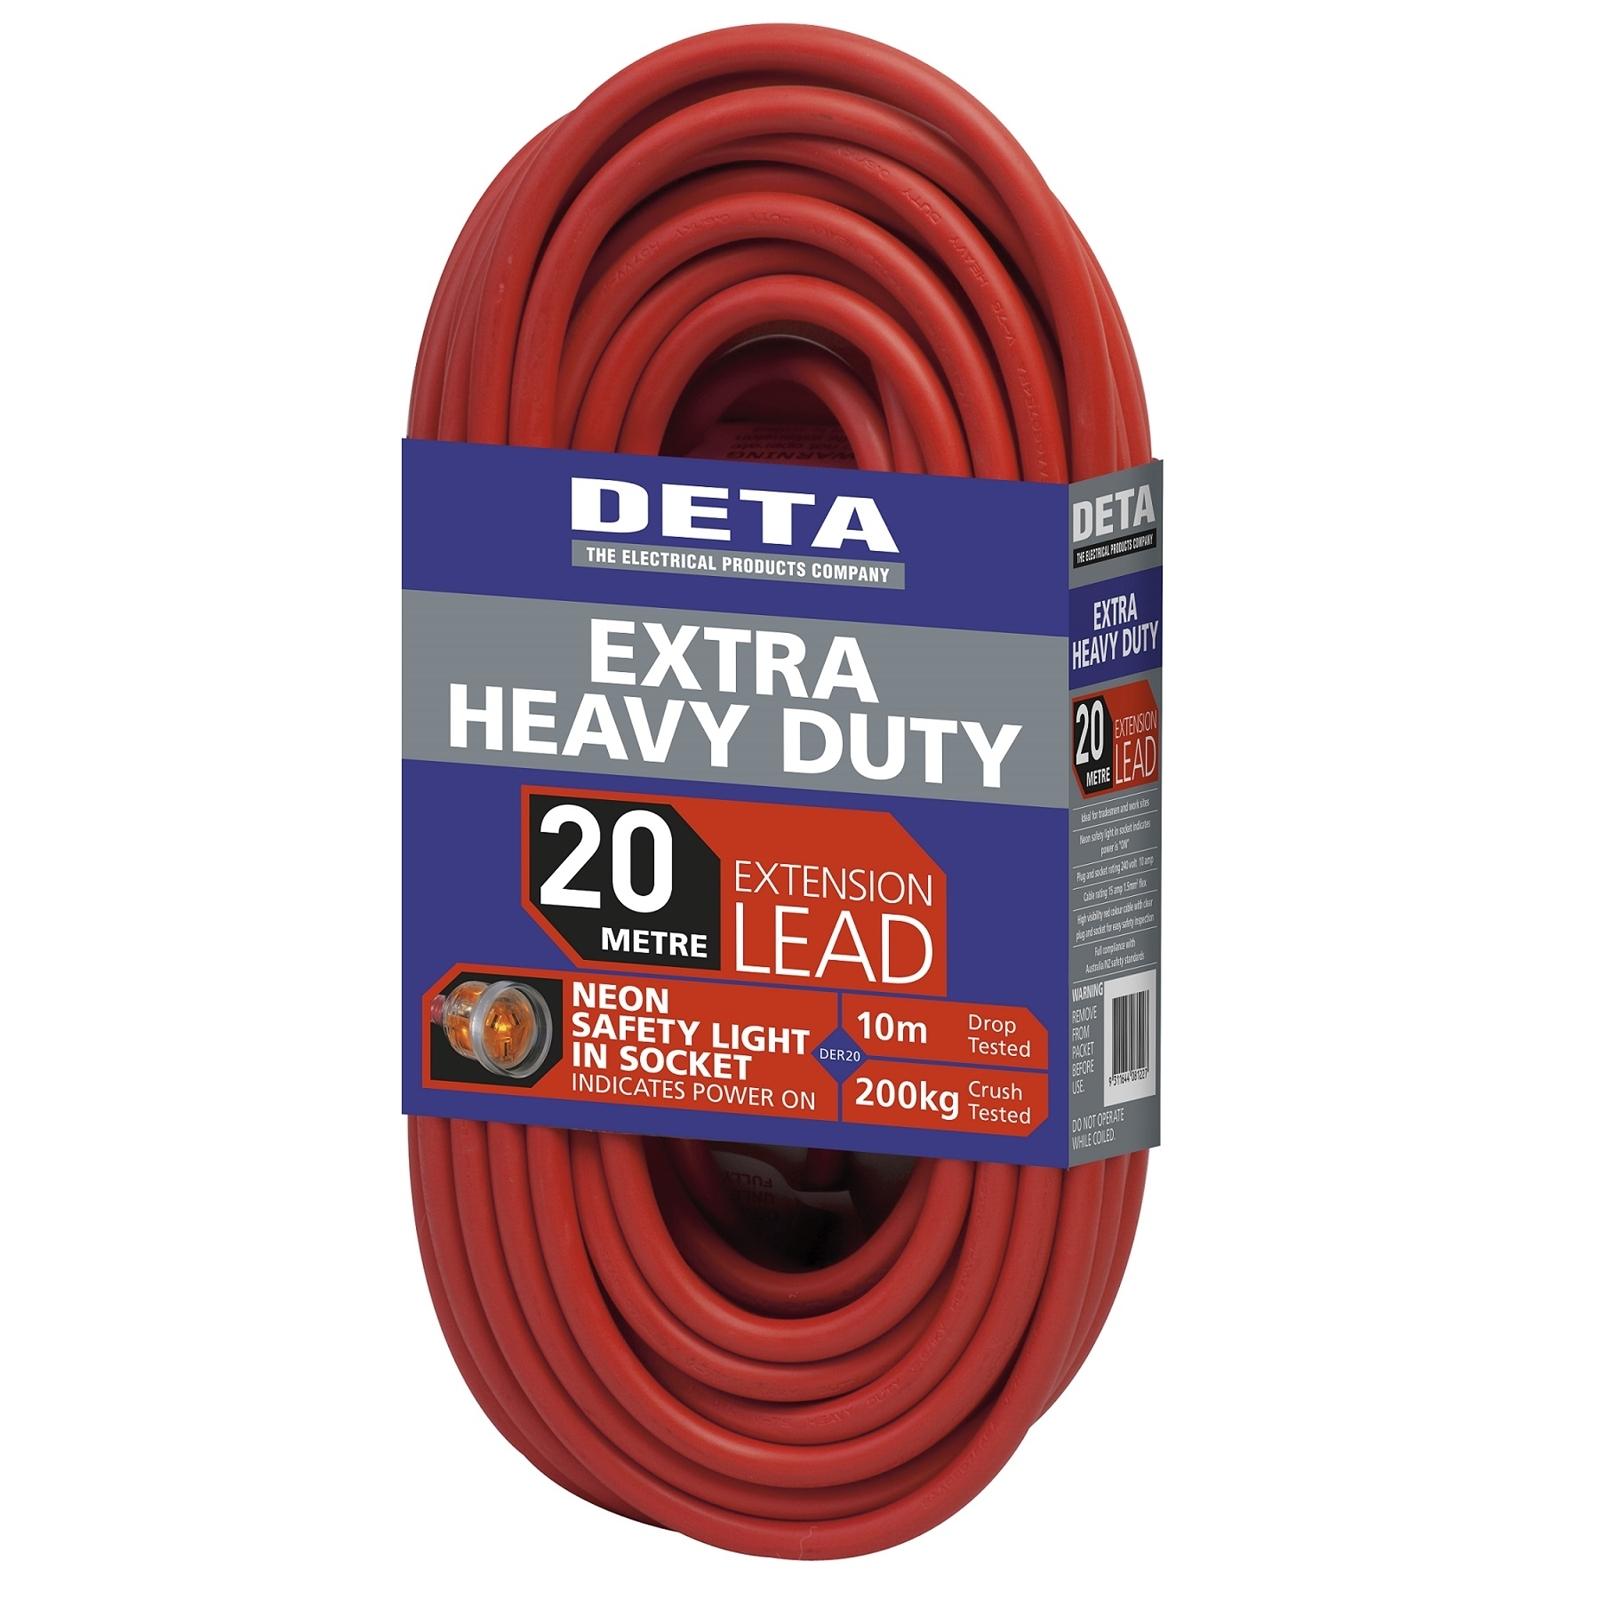 Deta 20m Extra Heavy Duty Extension Lead